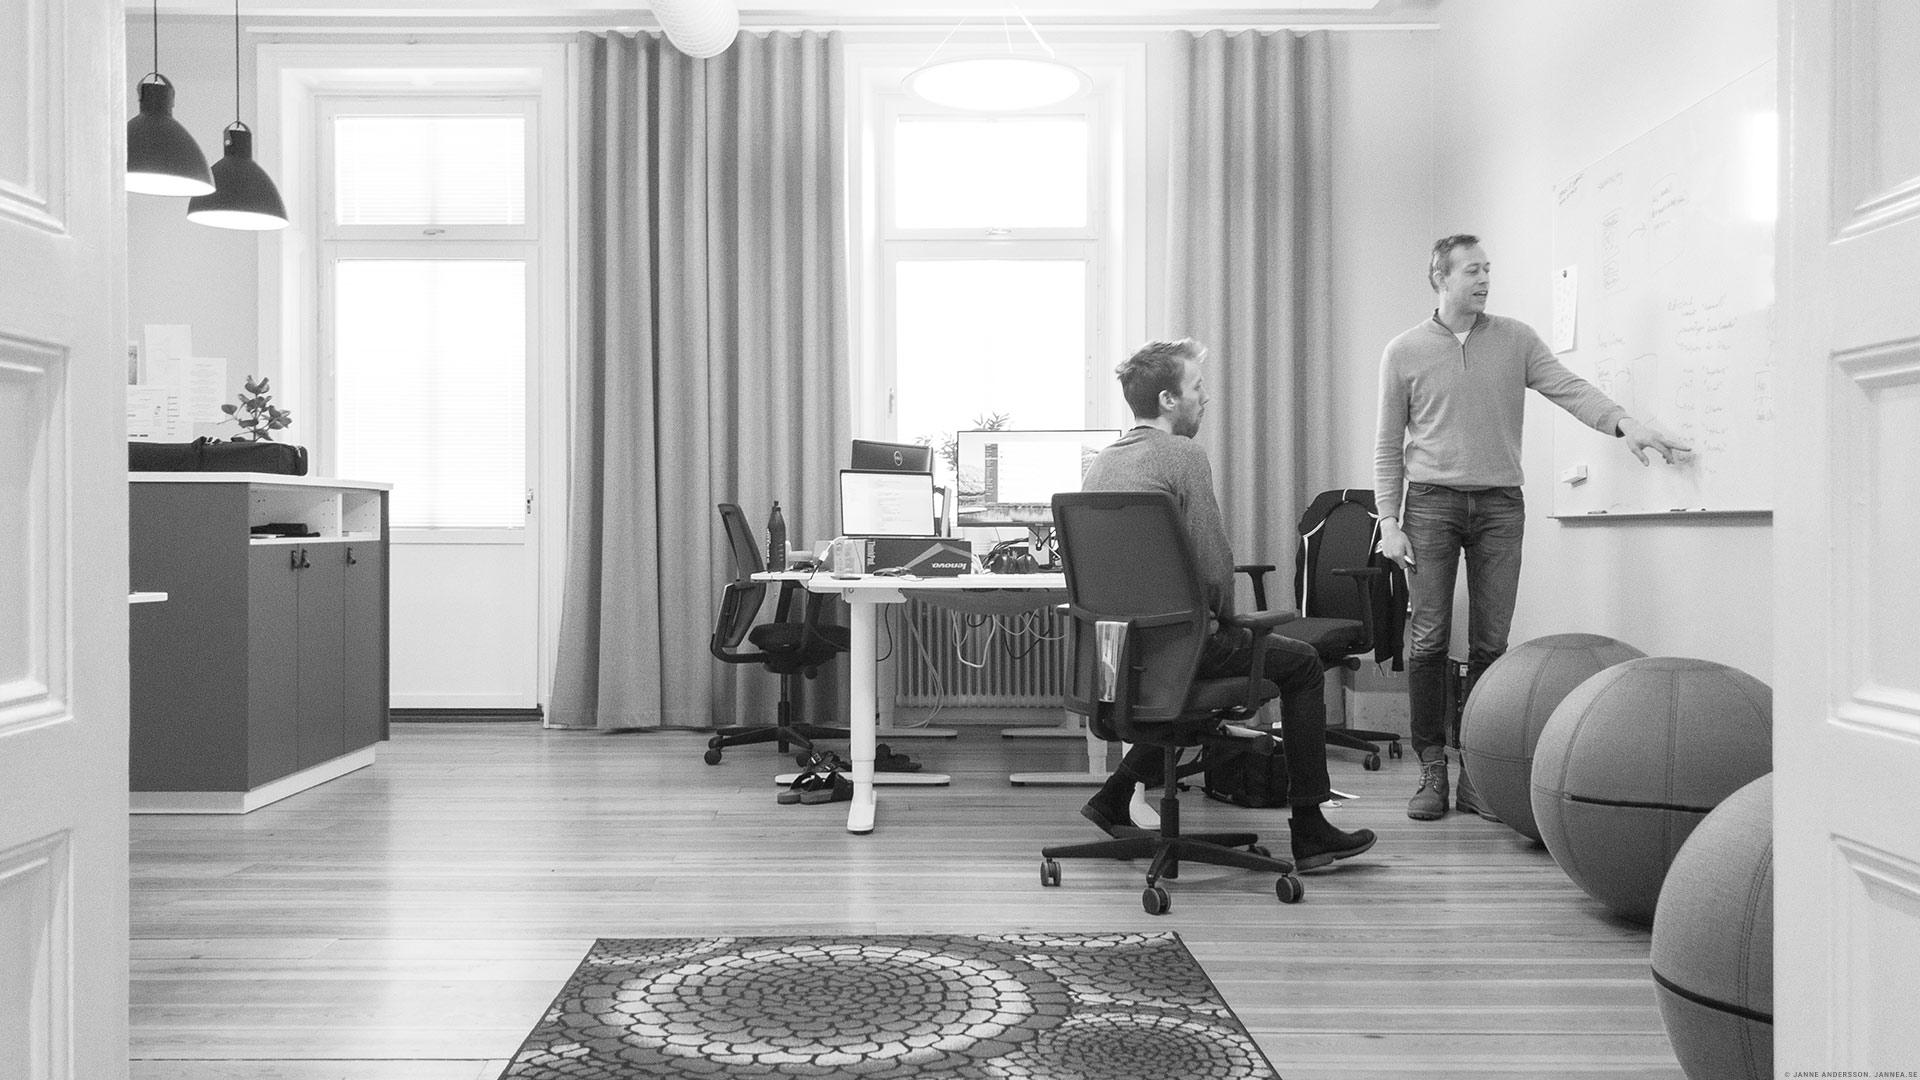 På jobbet pratar de |© Janne A